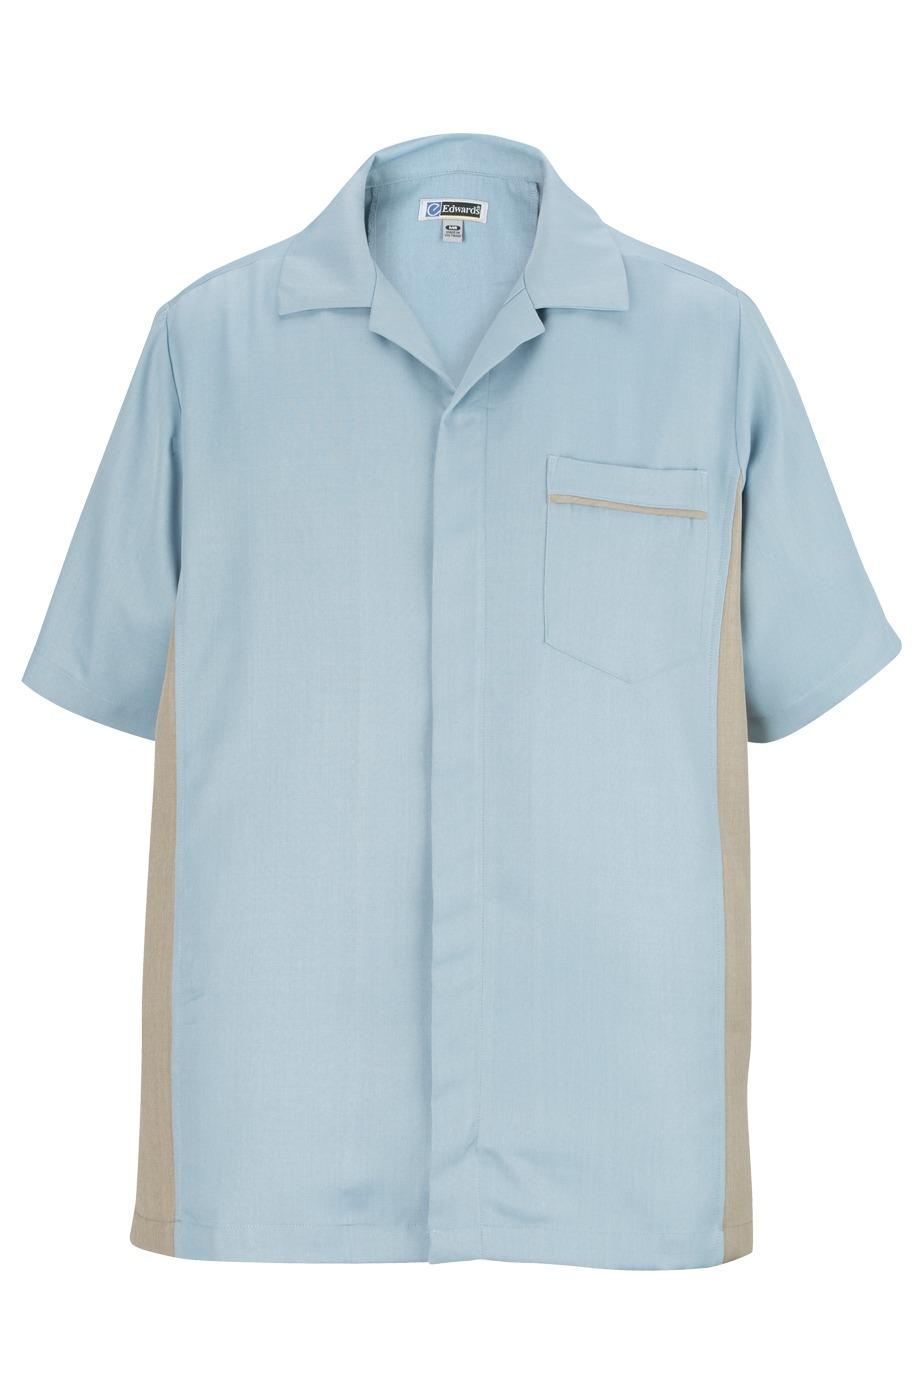 Edwards Garment 4890 - Premier Service Shirt